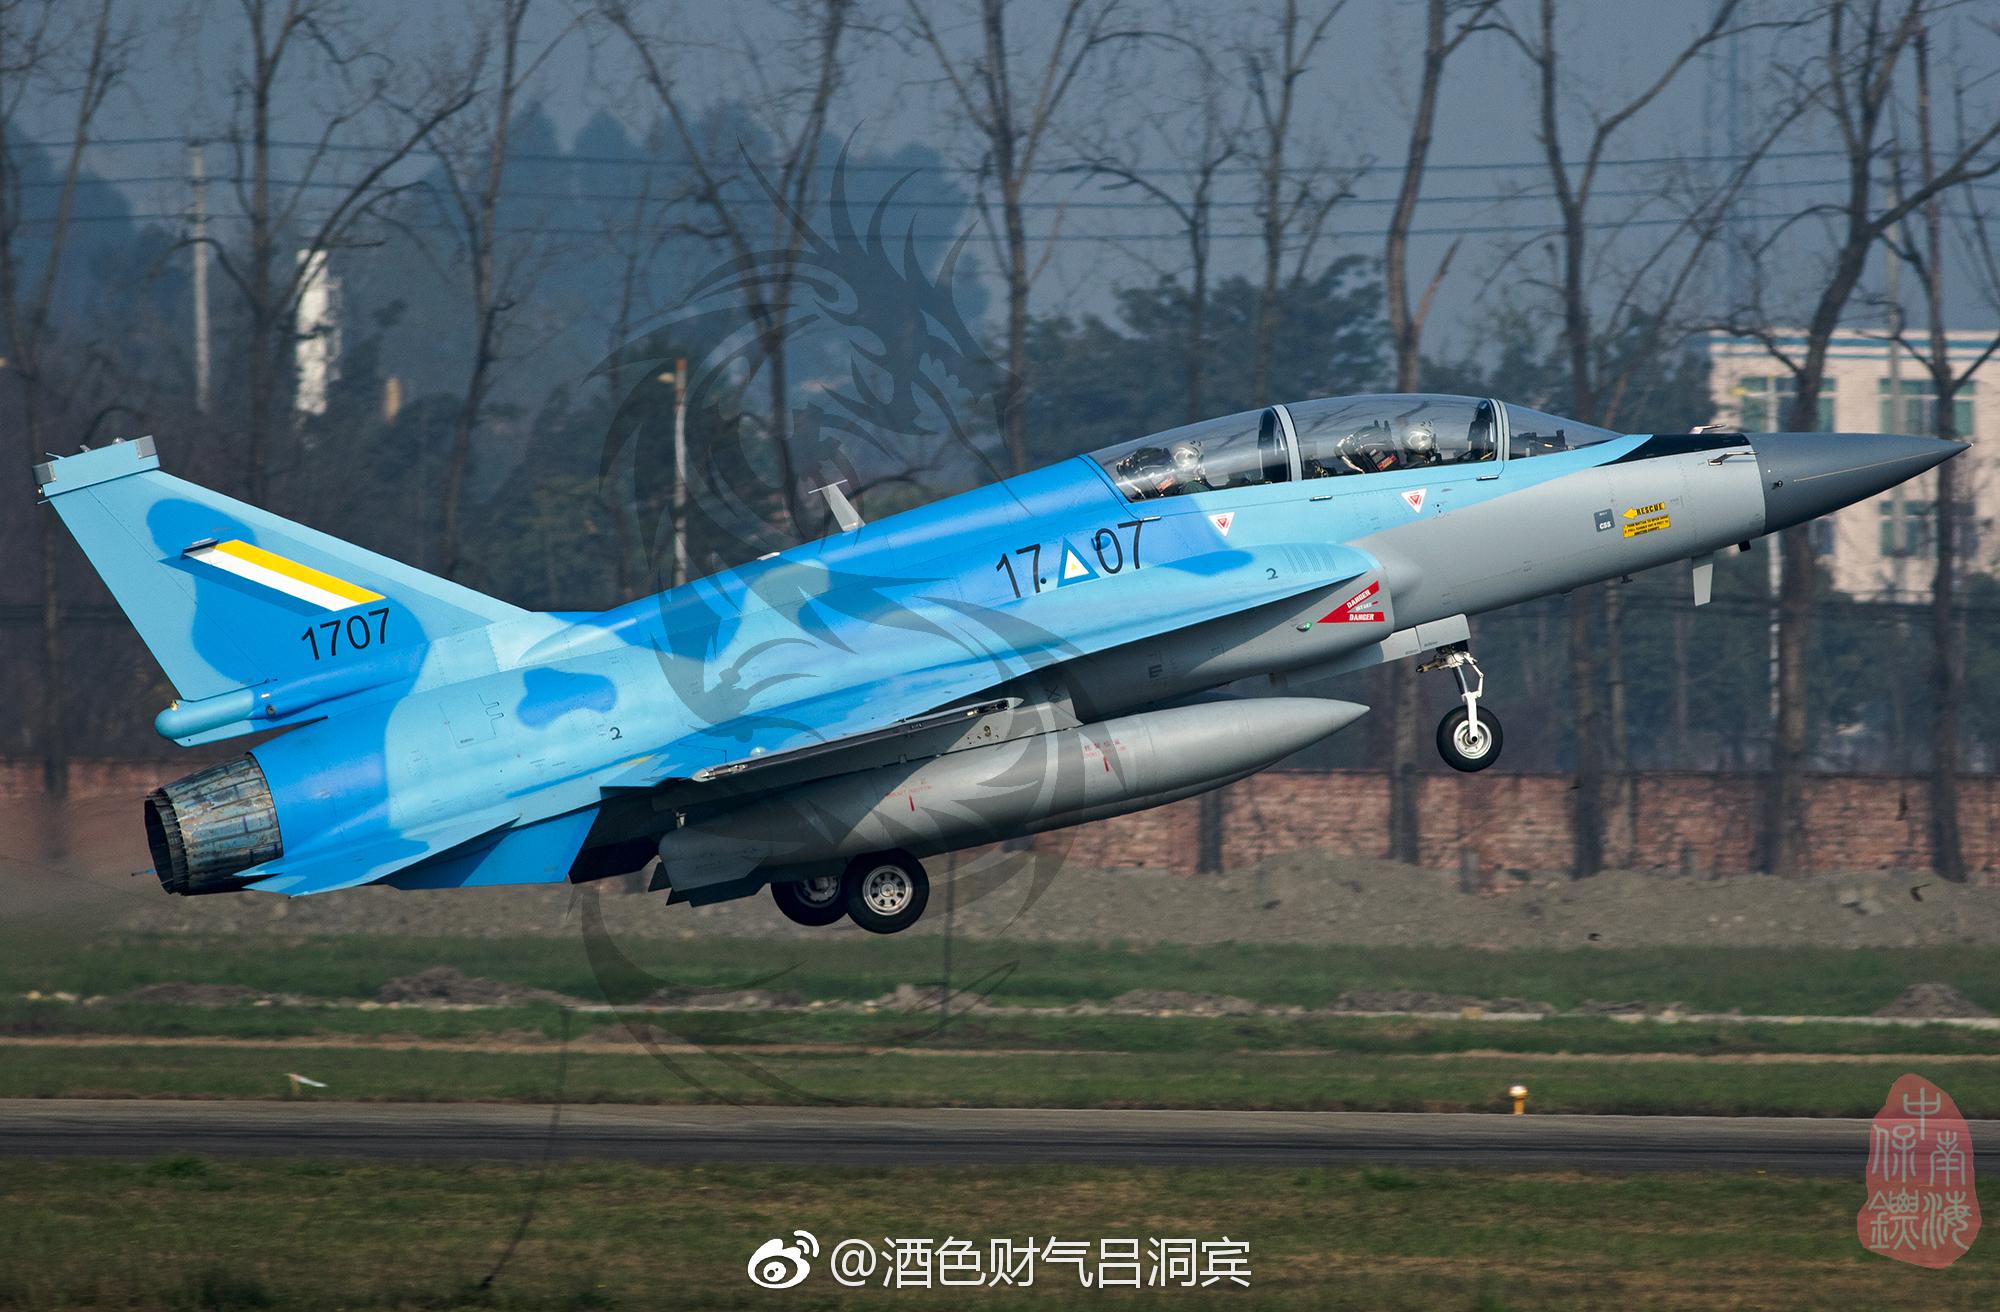 China Arms Exports - Page 3 6686298_original